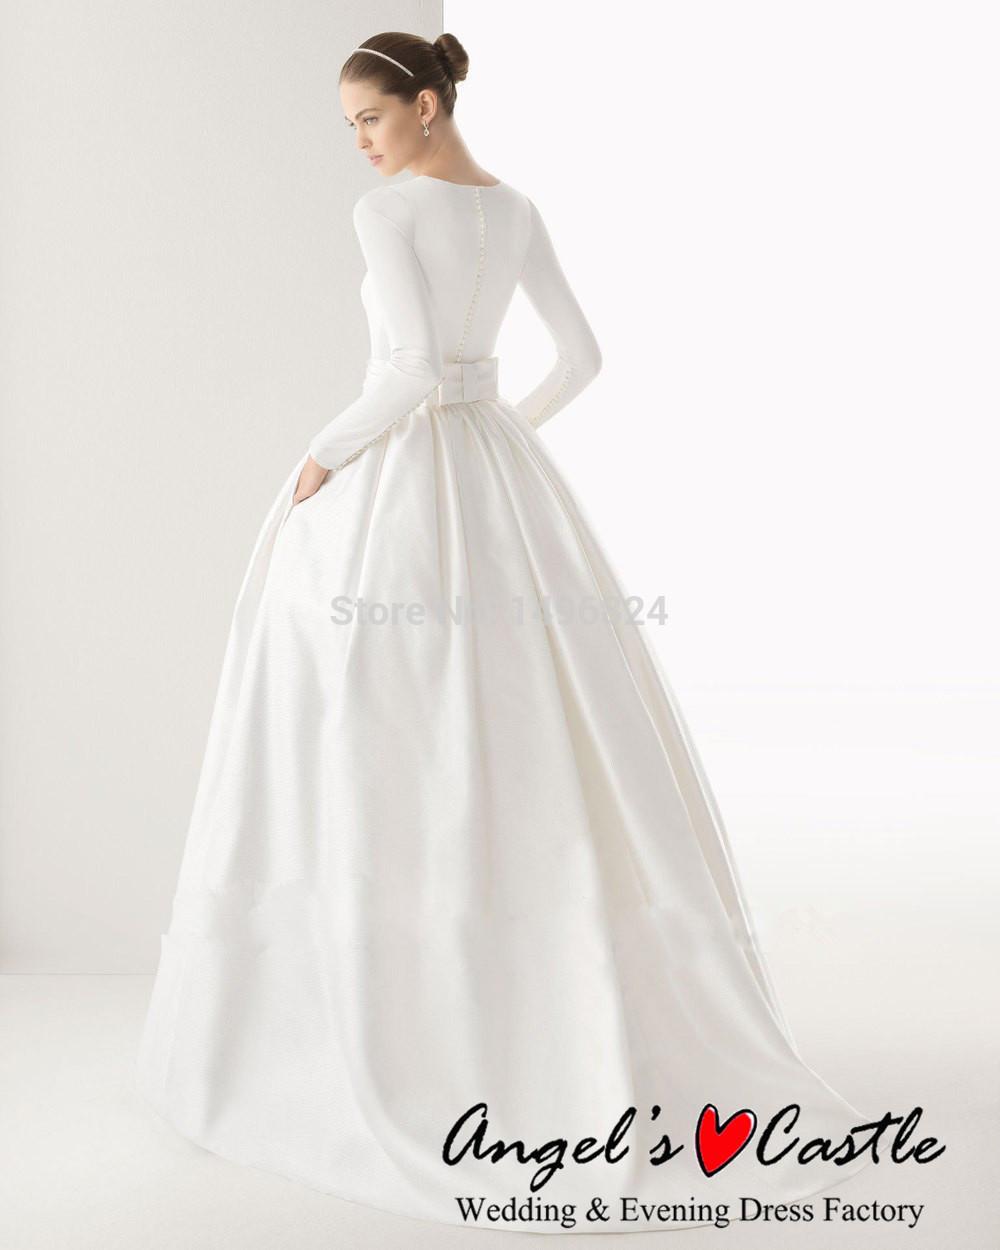 Muslim Wedding Dress Code For Bride : Wedding dress white vintage plus size muslim hijab dresses